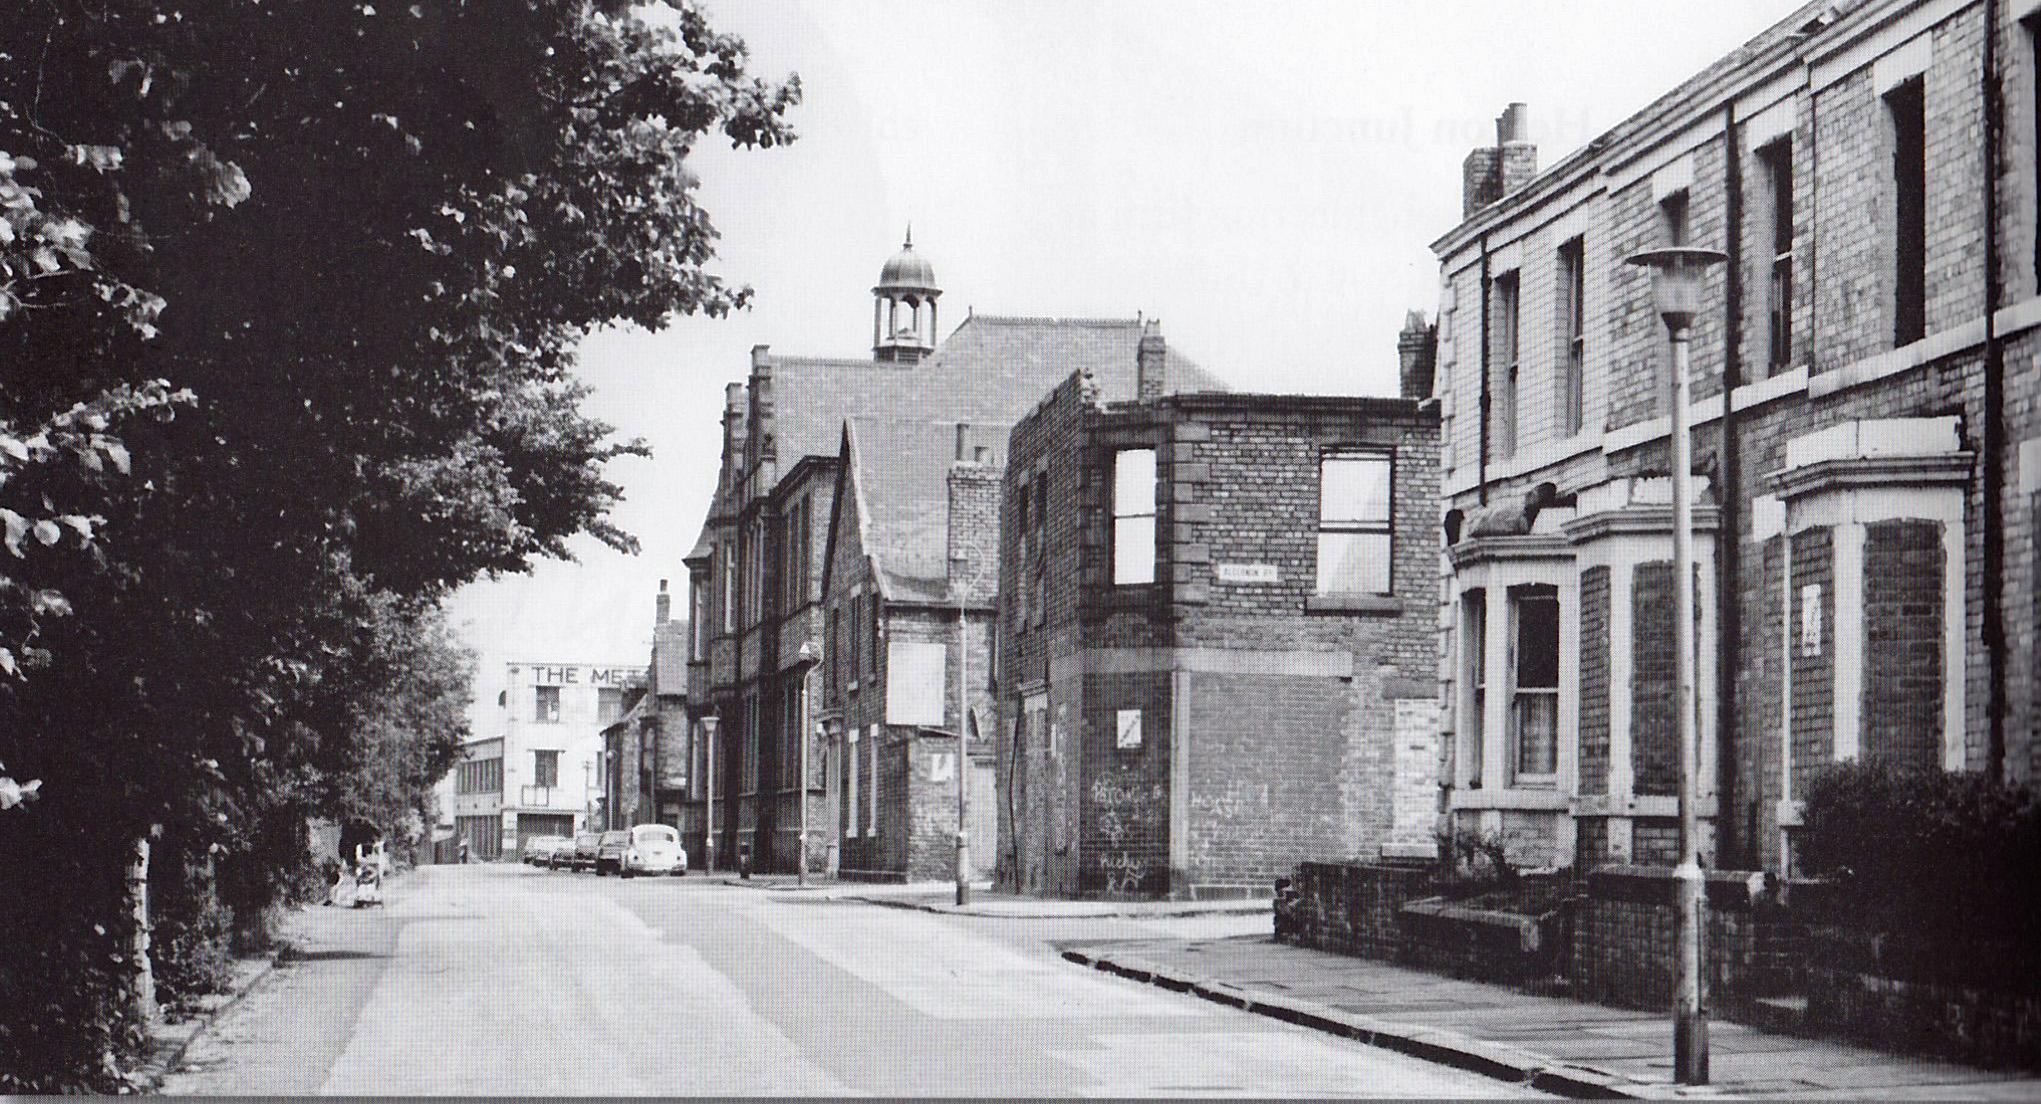 Leighton Primitive Methodist Church Heaton History Group